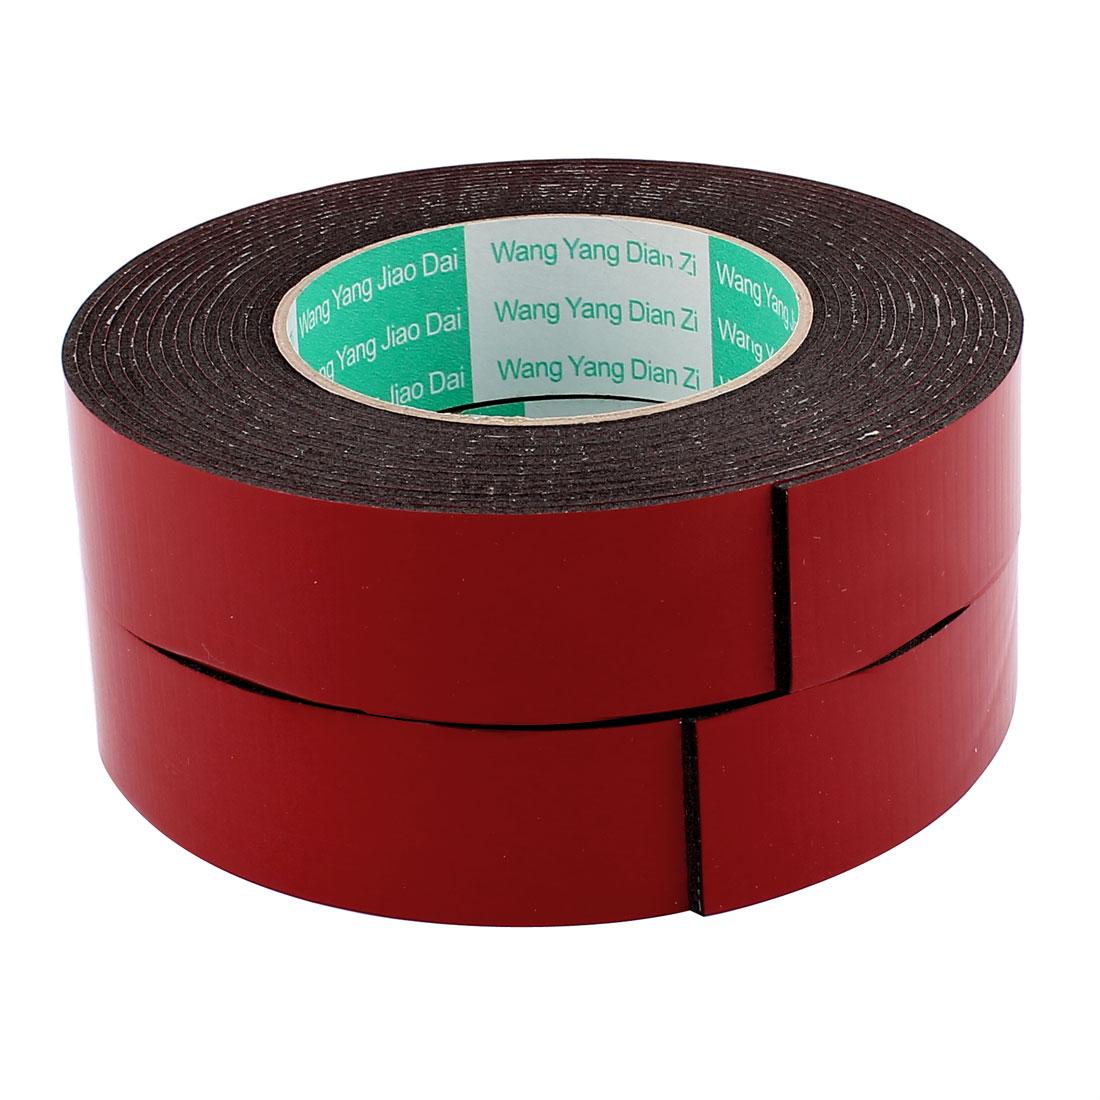 2 Pcs 30mmx2mm Double Sided Sponge Tape Adhesive Sticker Foam Glue Strip Sealing 5 Meters 16Ft